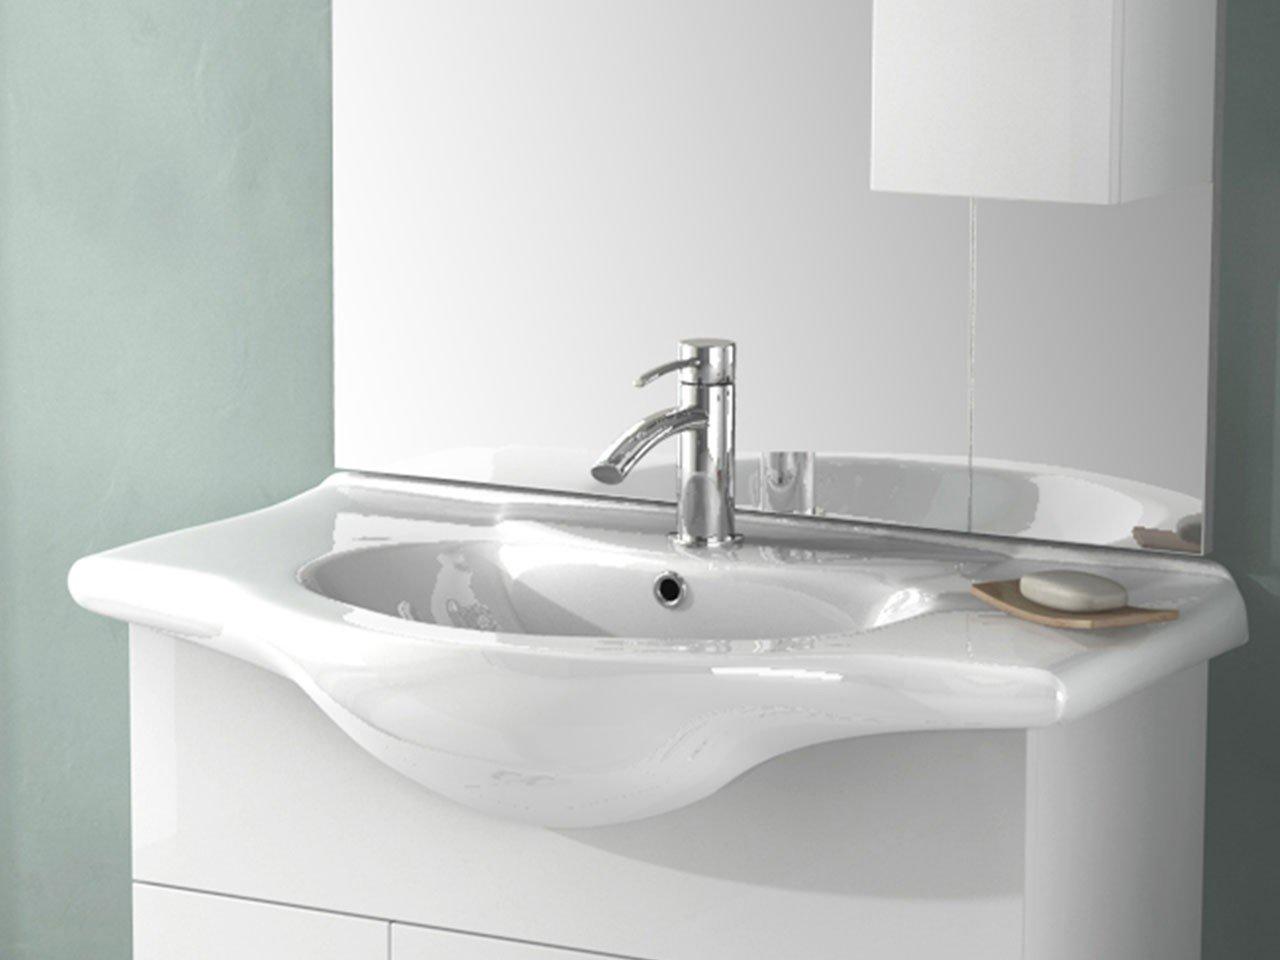 soft easy 85 lavabo integrale 85x50 ceramica iperceramica